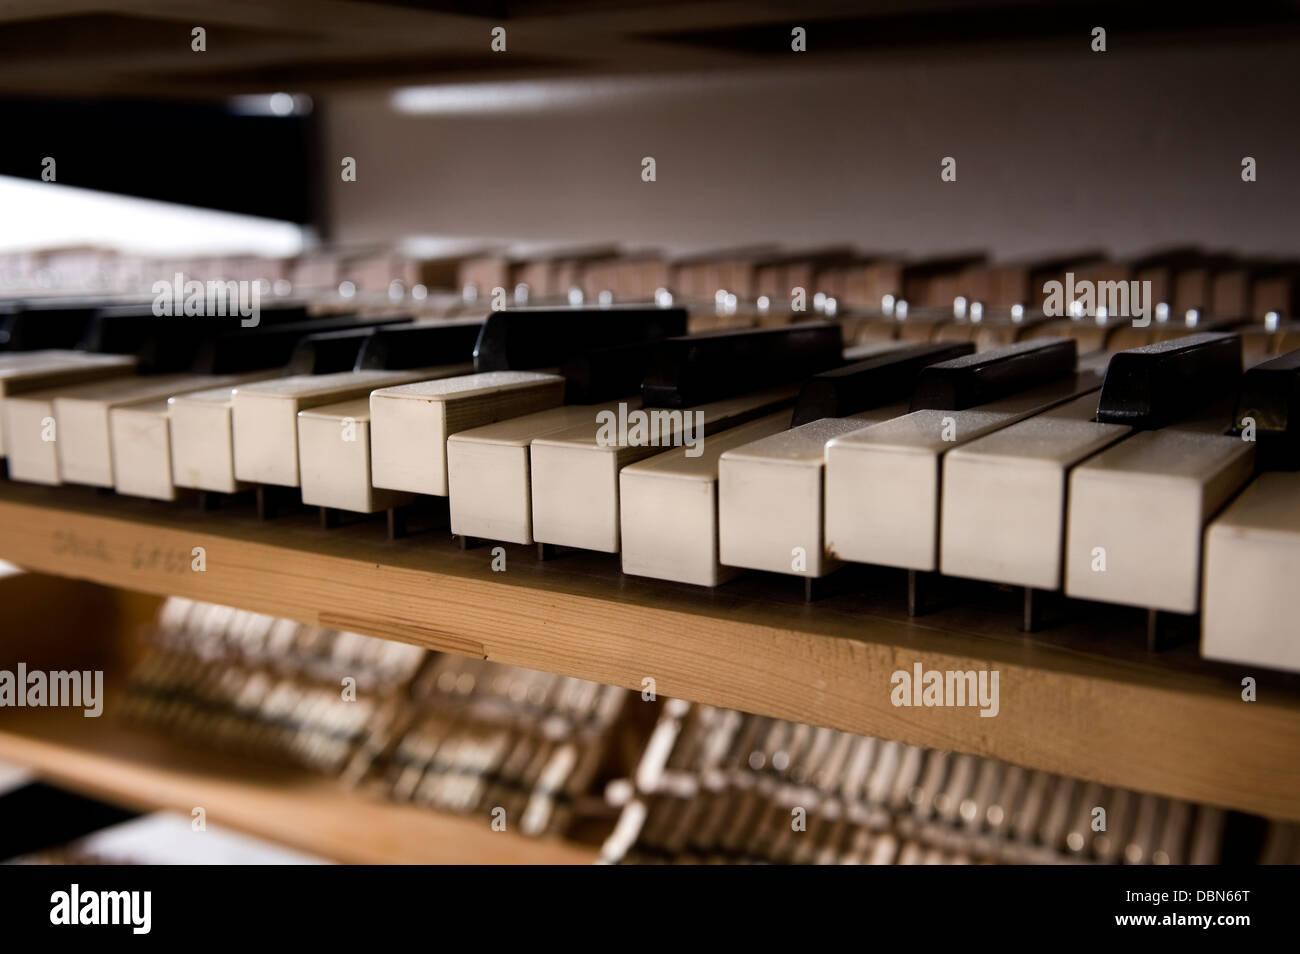 Musical mechanism of a piano, Regensburg, Bavaria, Germany - Stock Image